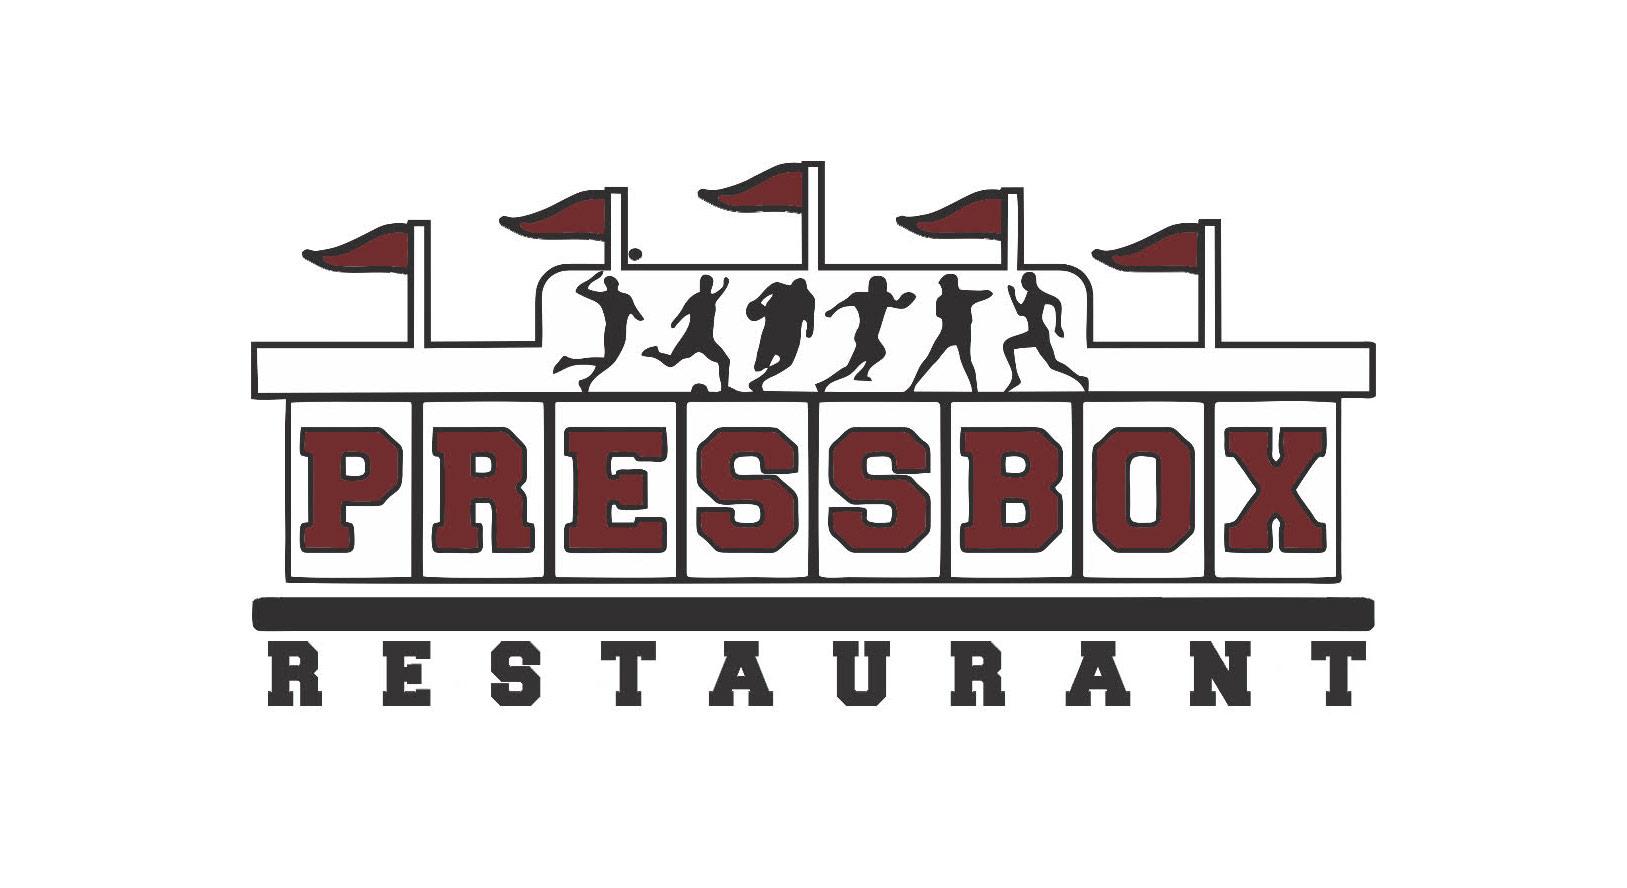 Pressbox Restaurant